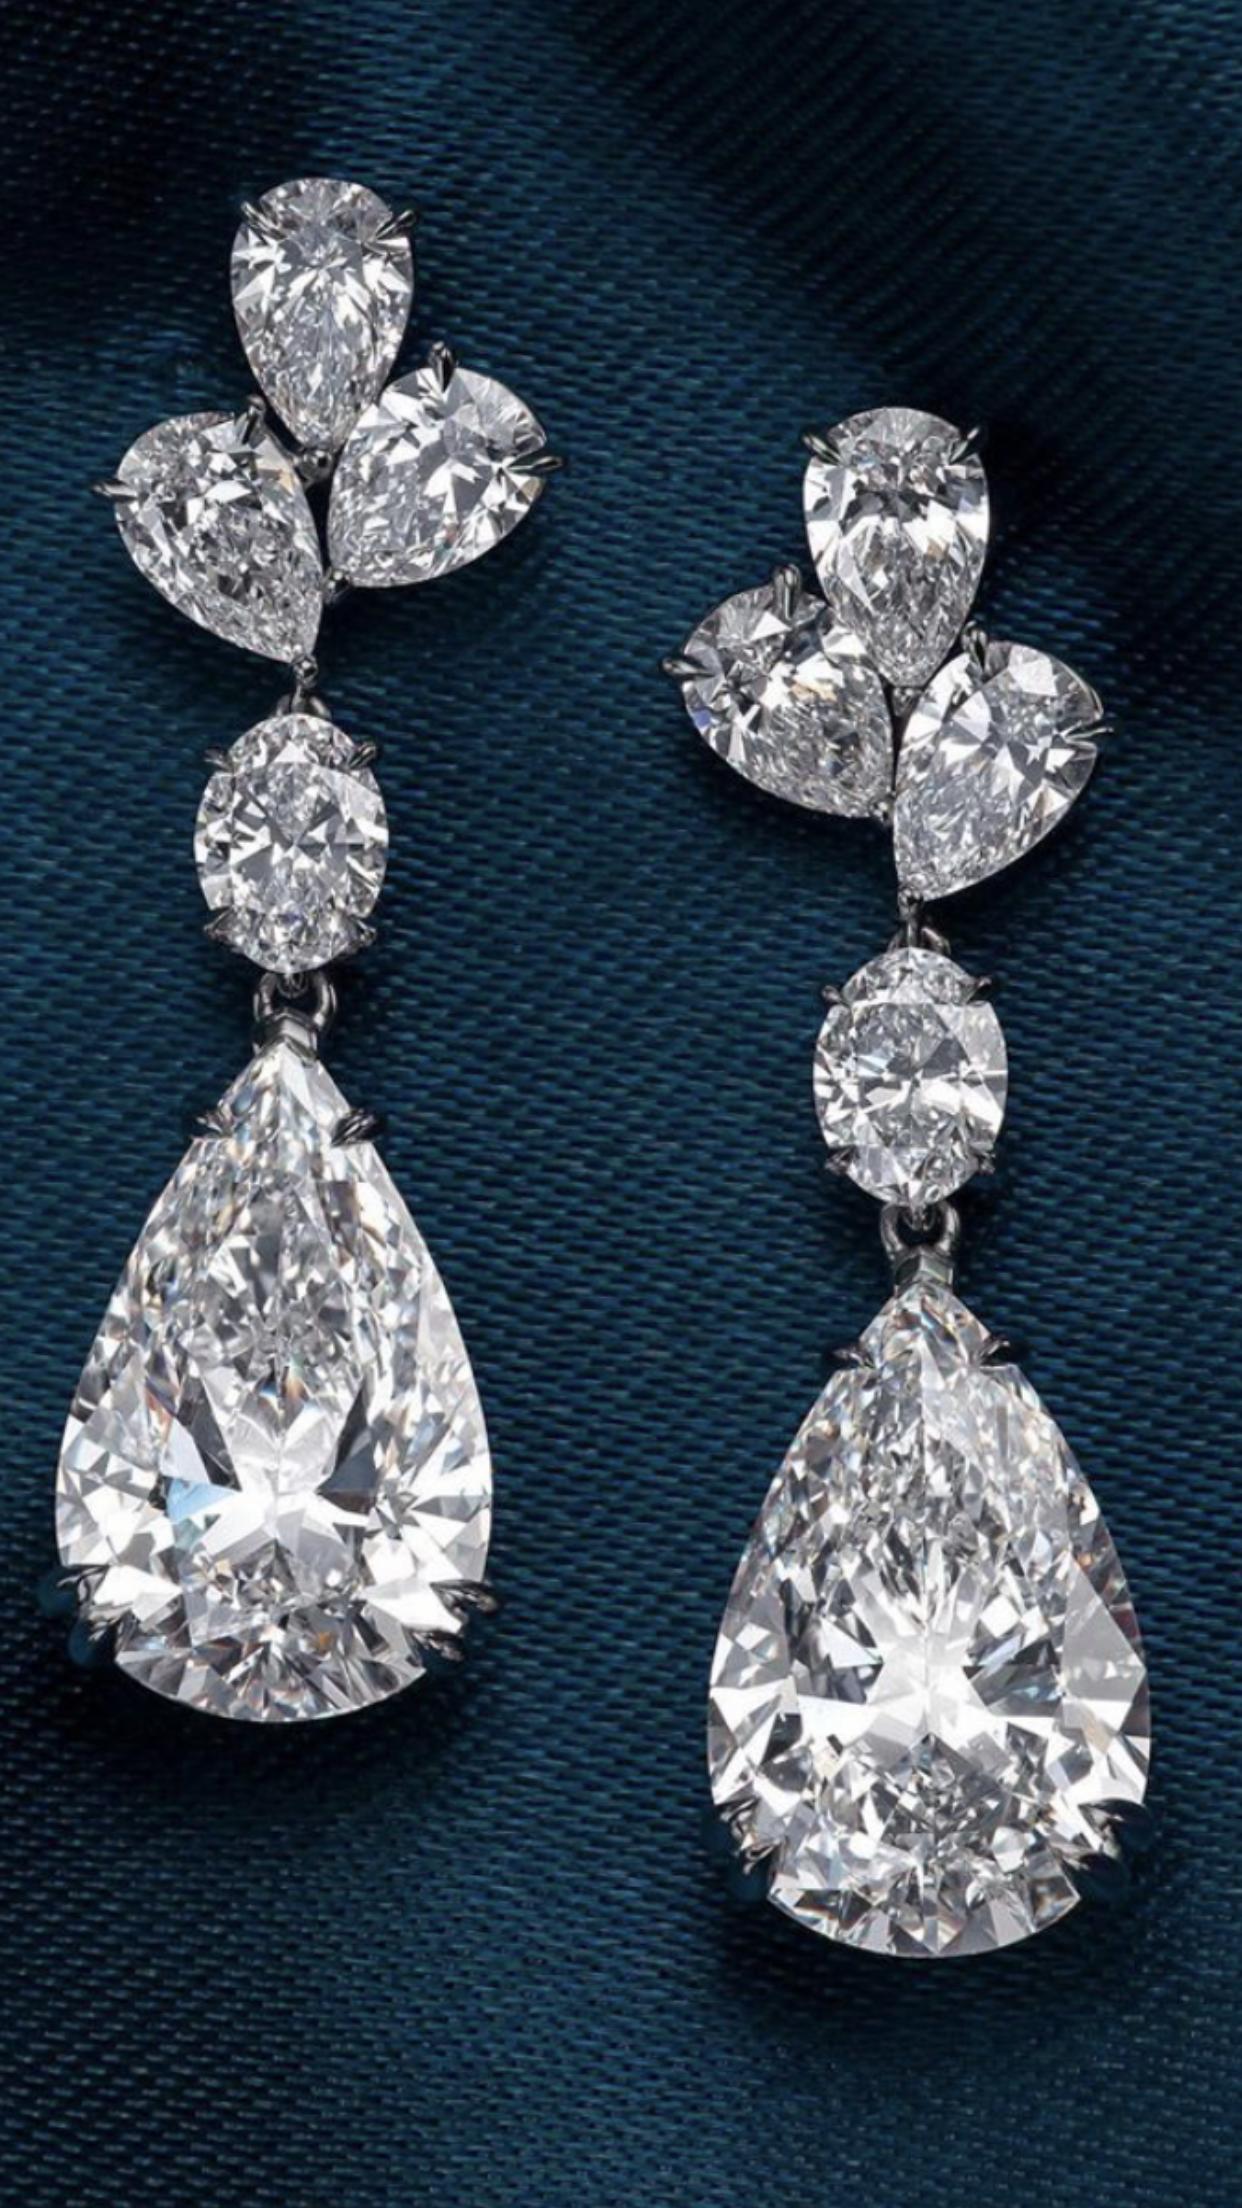 Magnificent Diamond Earrings Diamond Bracelet Design Diamond Earrings Studs Beautiful Jewelry